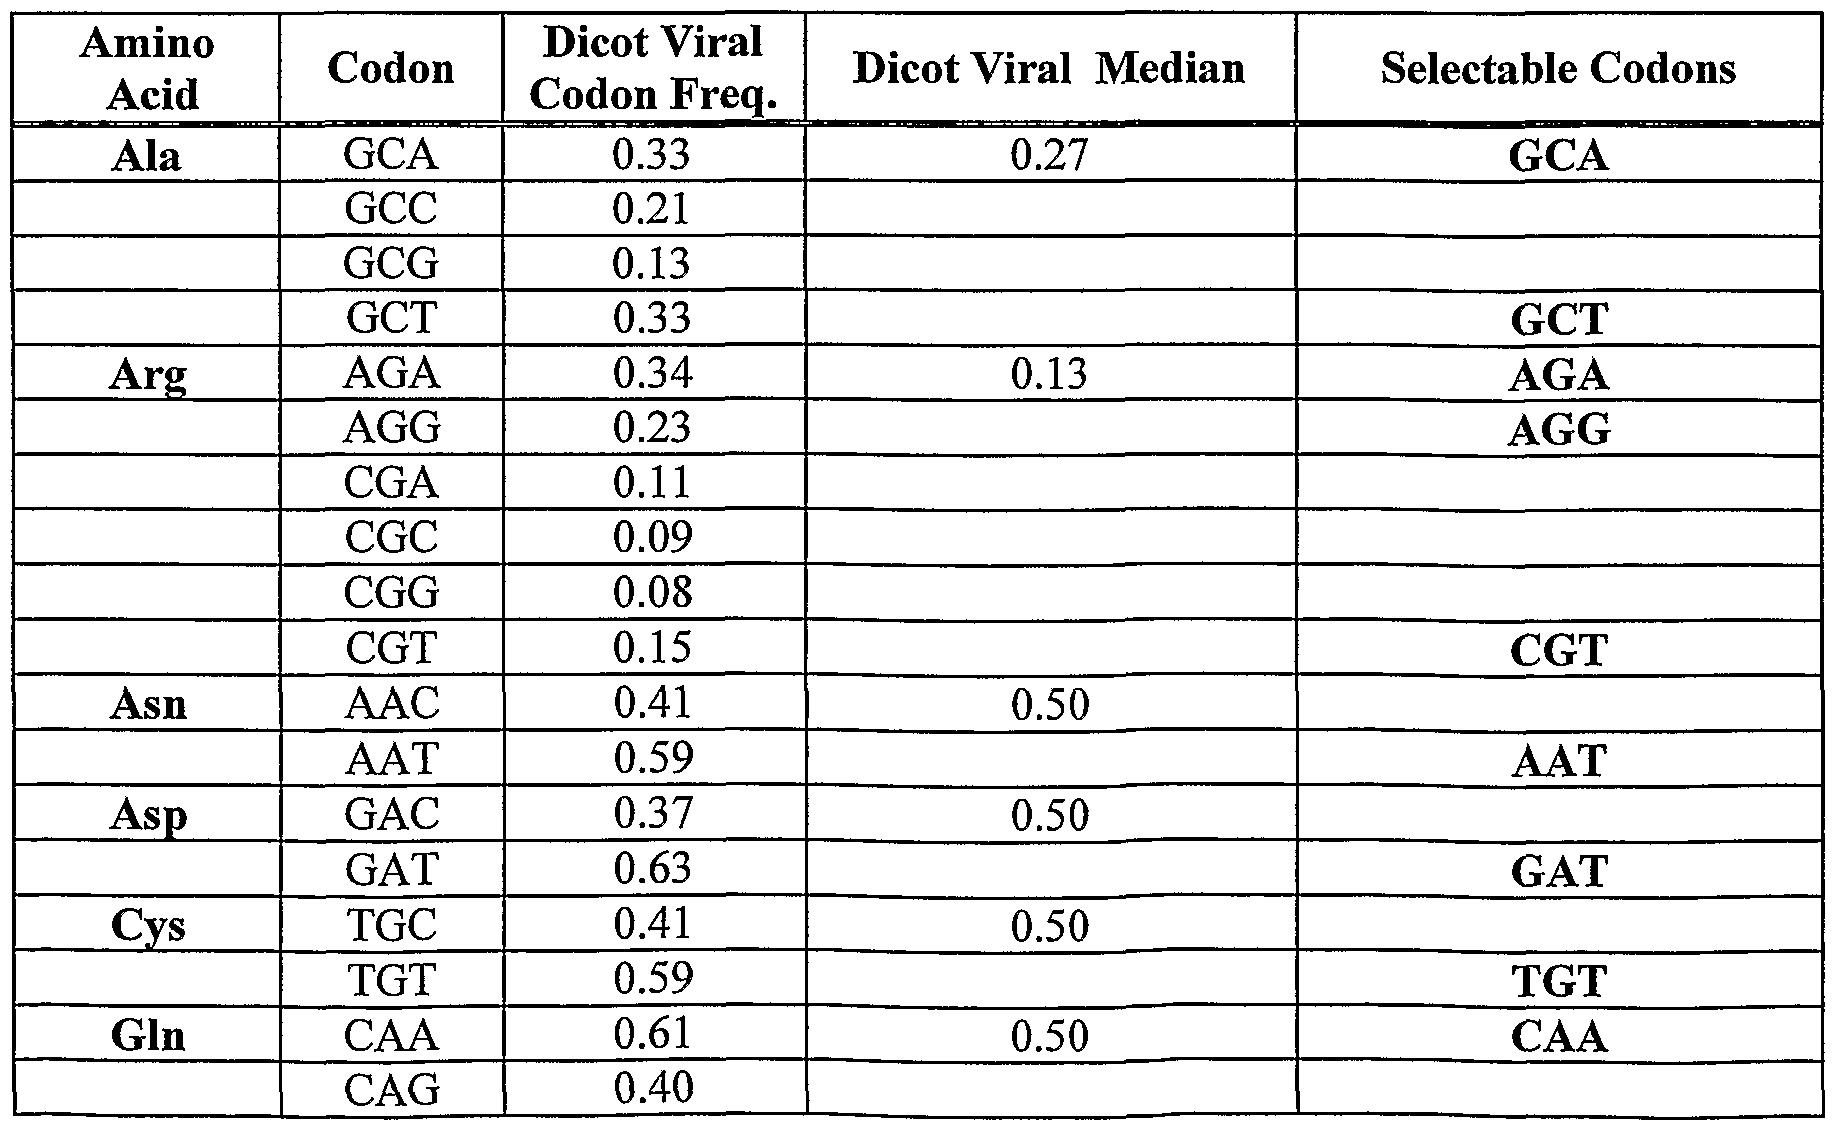 Cysteine Codon Usage Codon Usage Frequencies